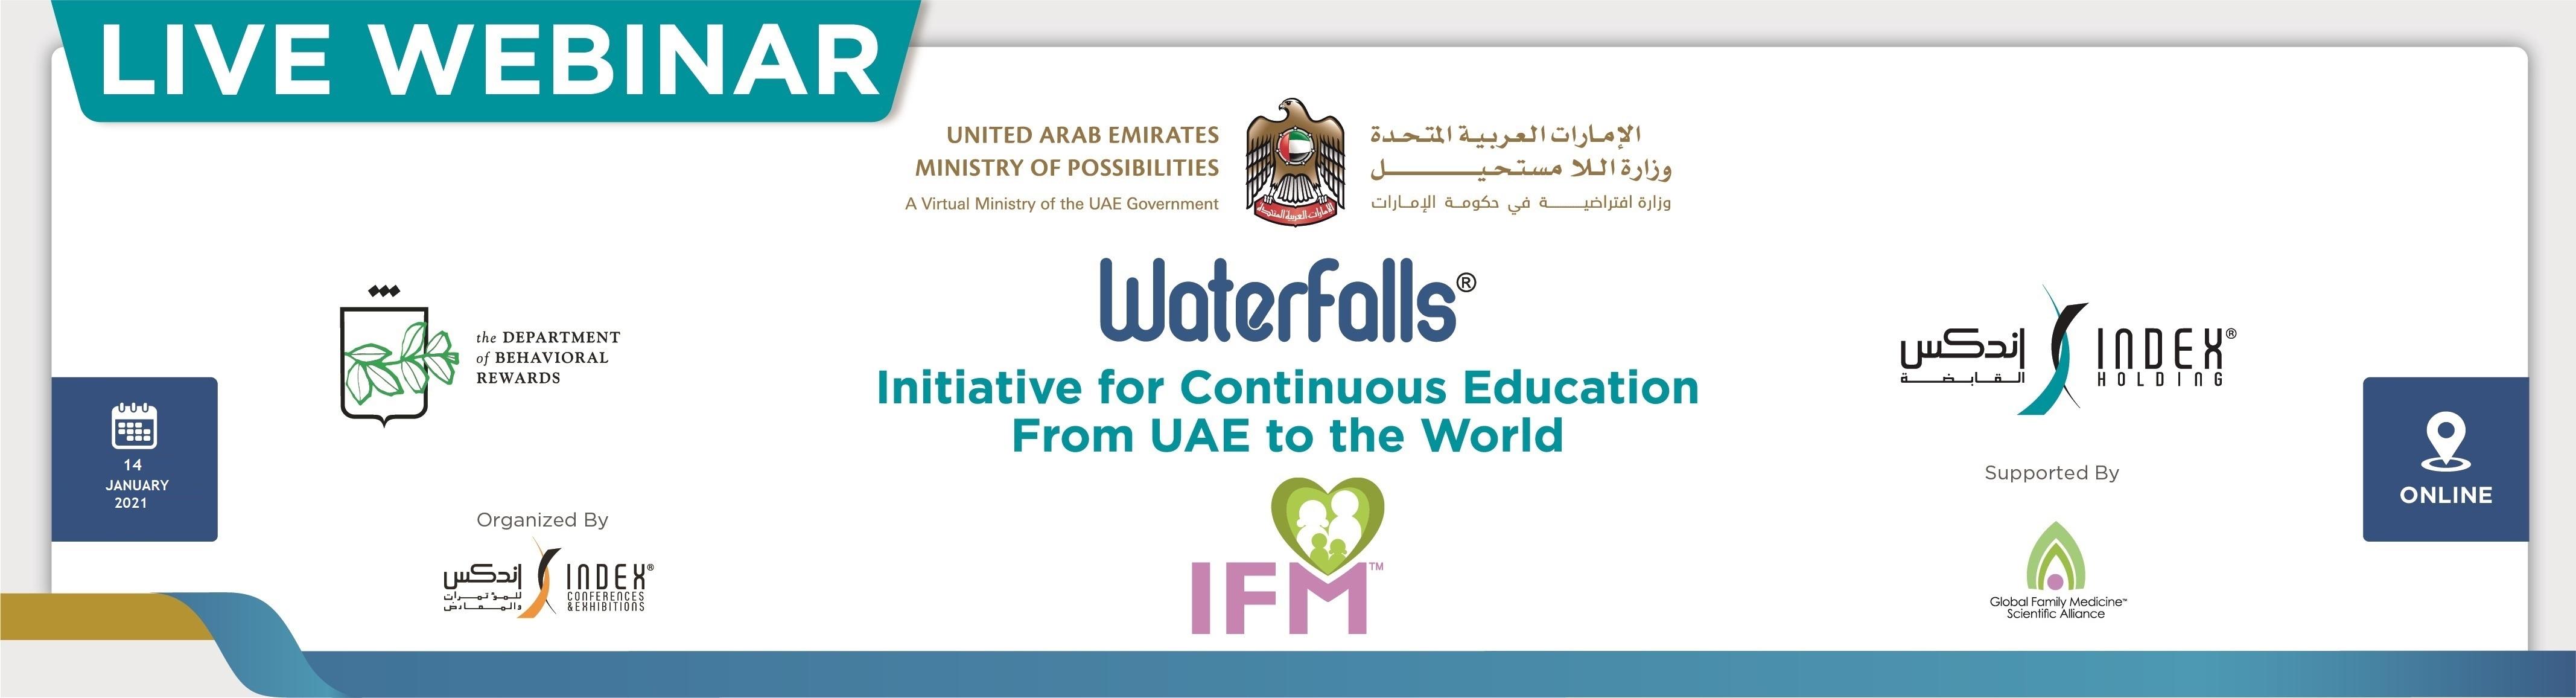 Webinar: Economics of Healthy and Unhealthy Behaviour - 14 Jan (18:00 - 19:00 UAE)